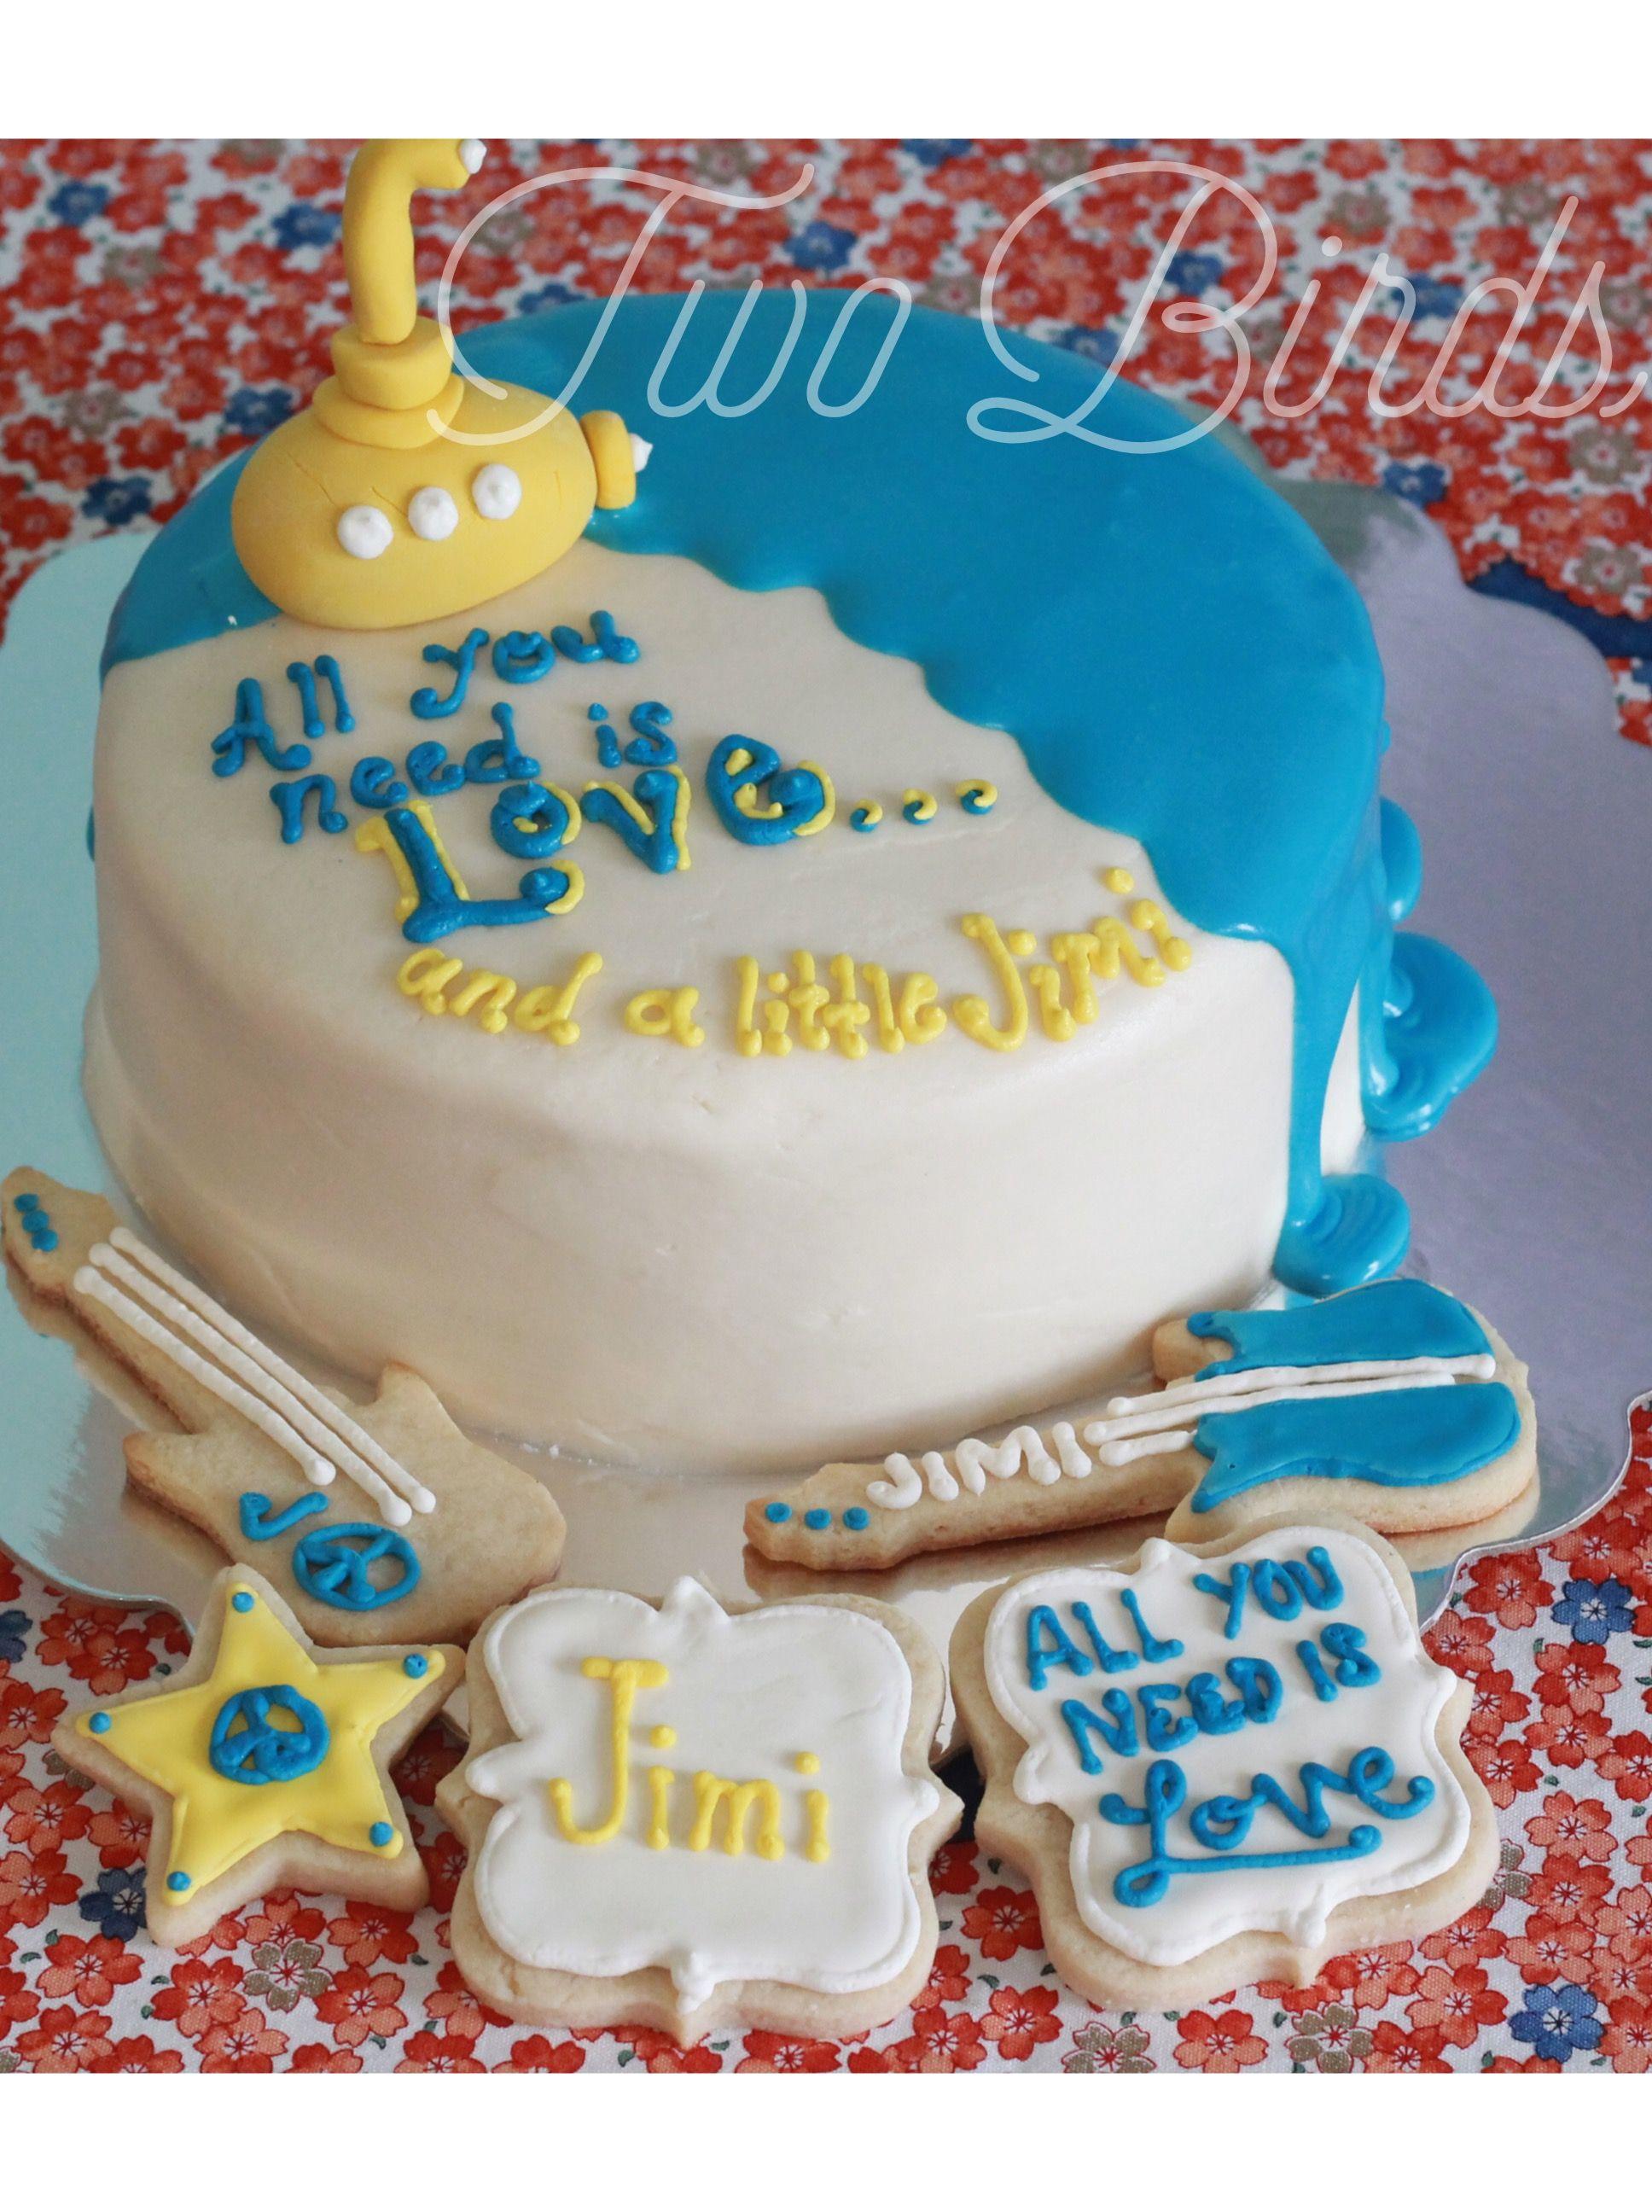 Gmail themes beatles - Beatles Cake Yellow Submarine Baby Shower Cake